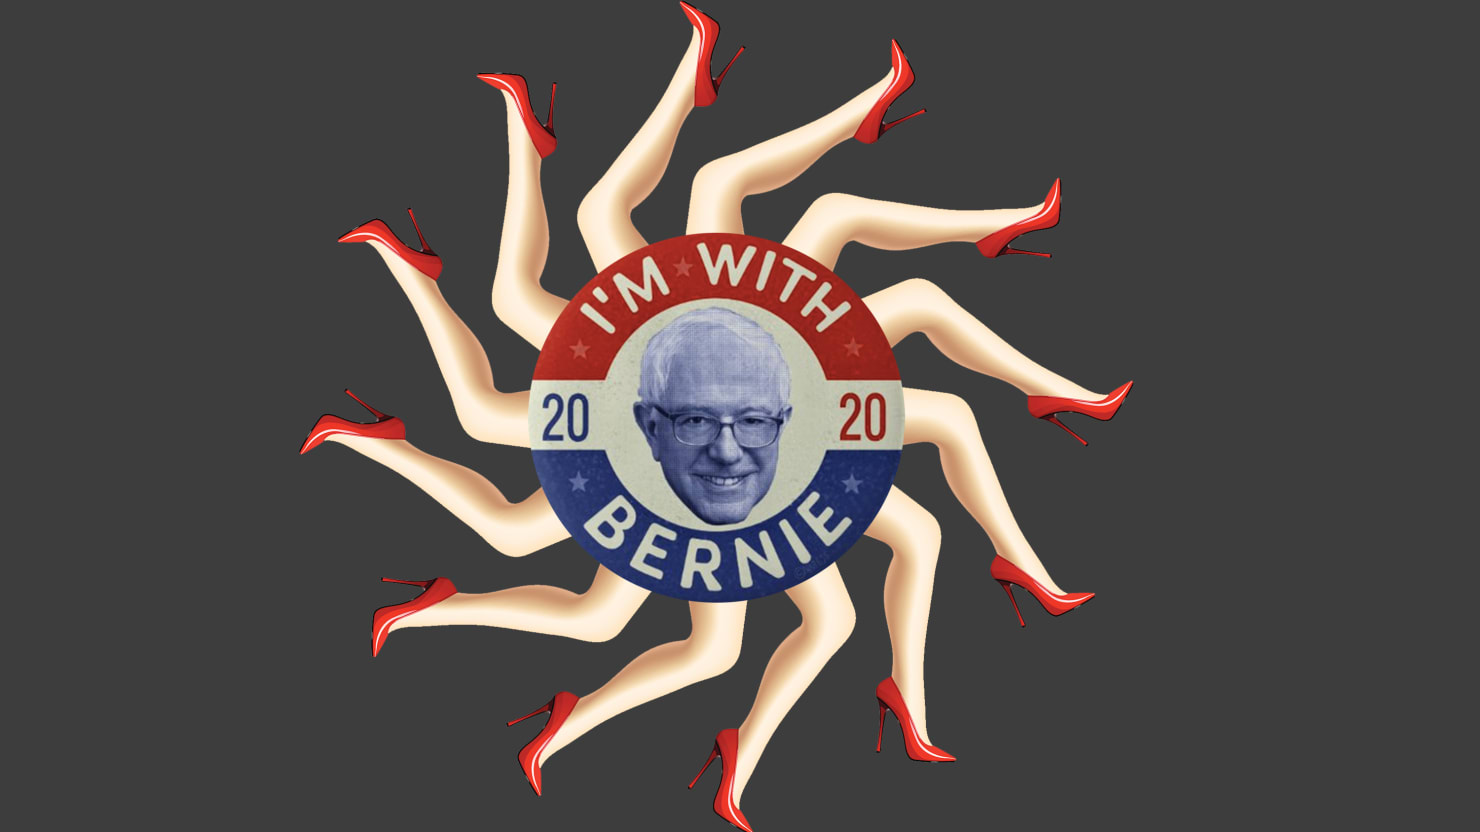 Porn Stars Are All In on President Bernie Sanders